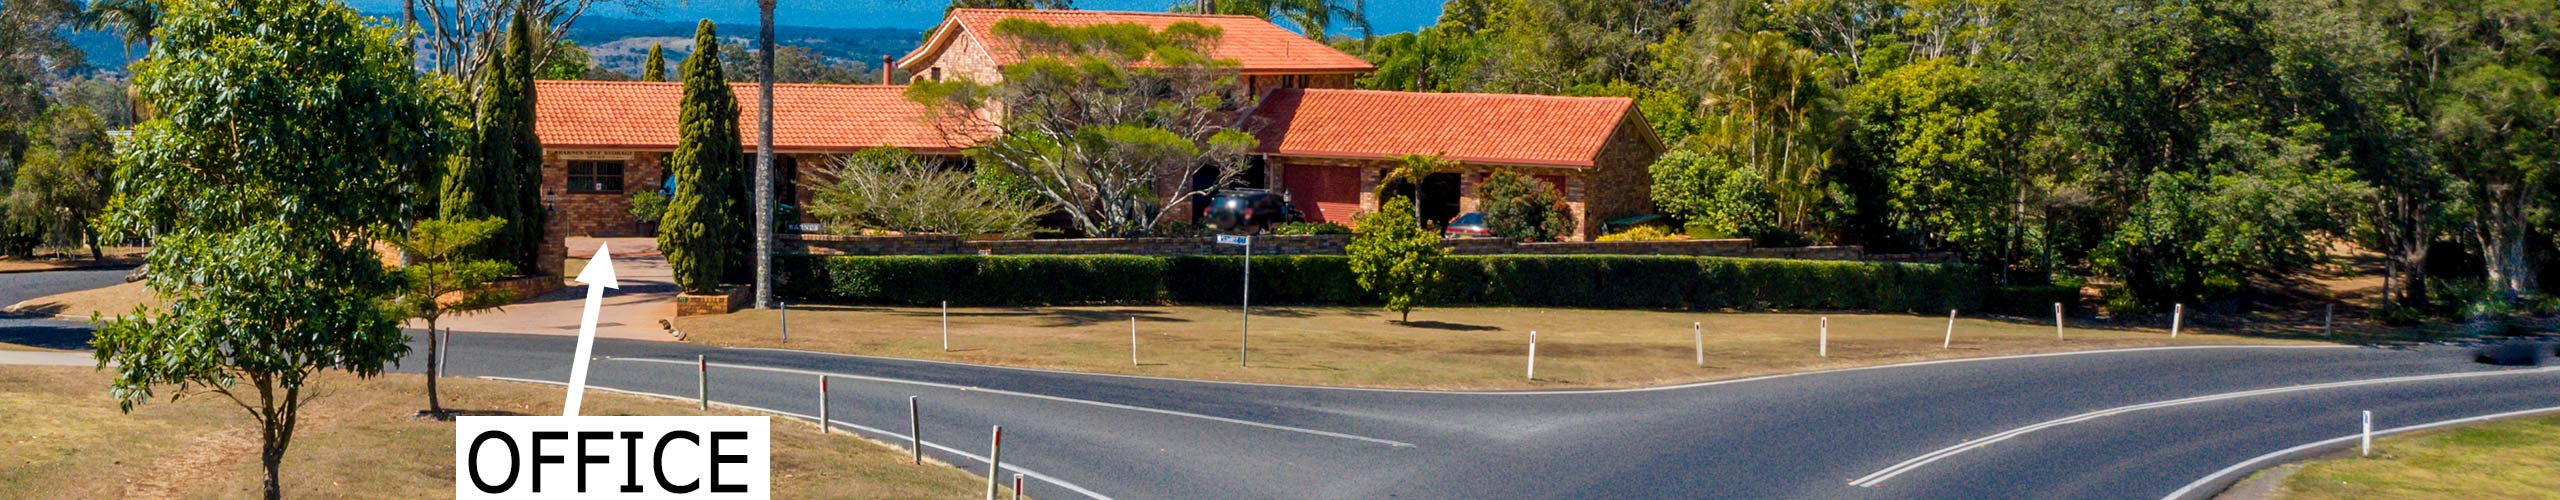 Lismore Self Storage NSW - Image